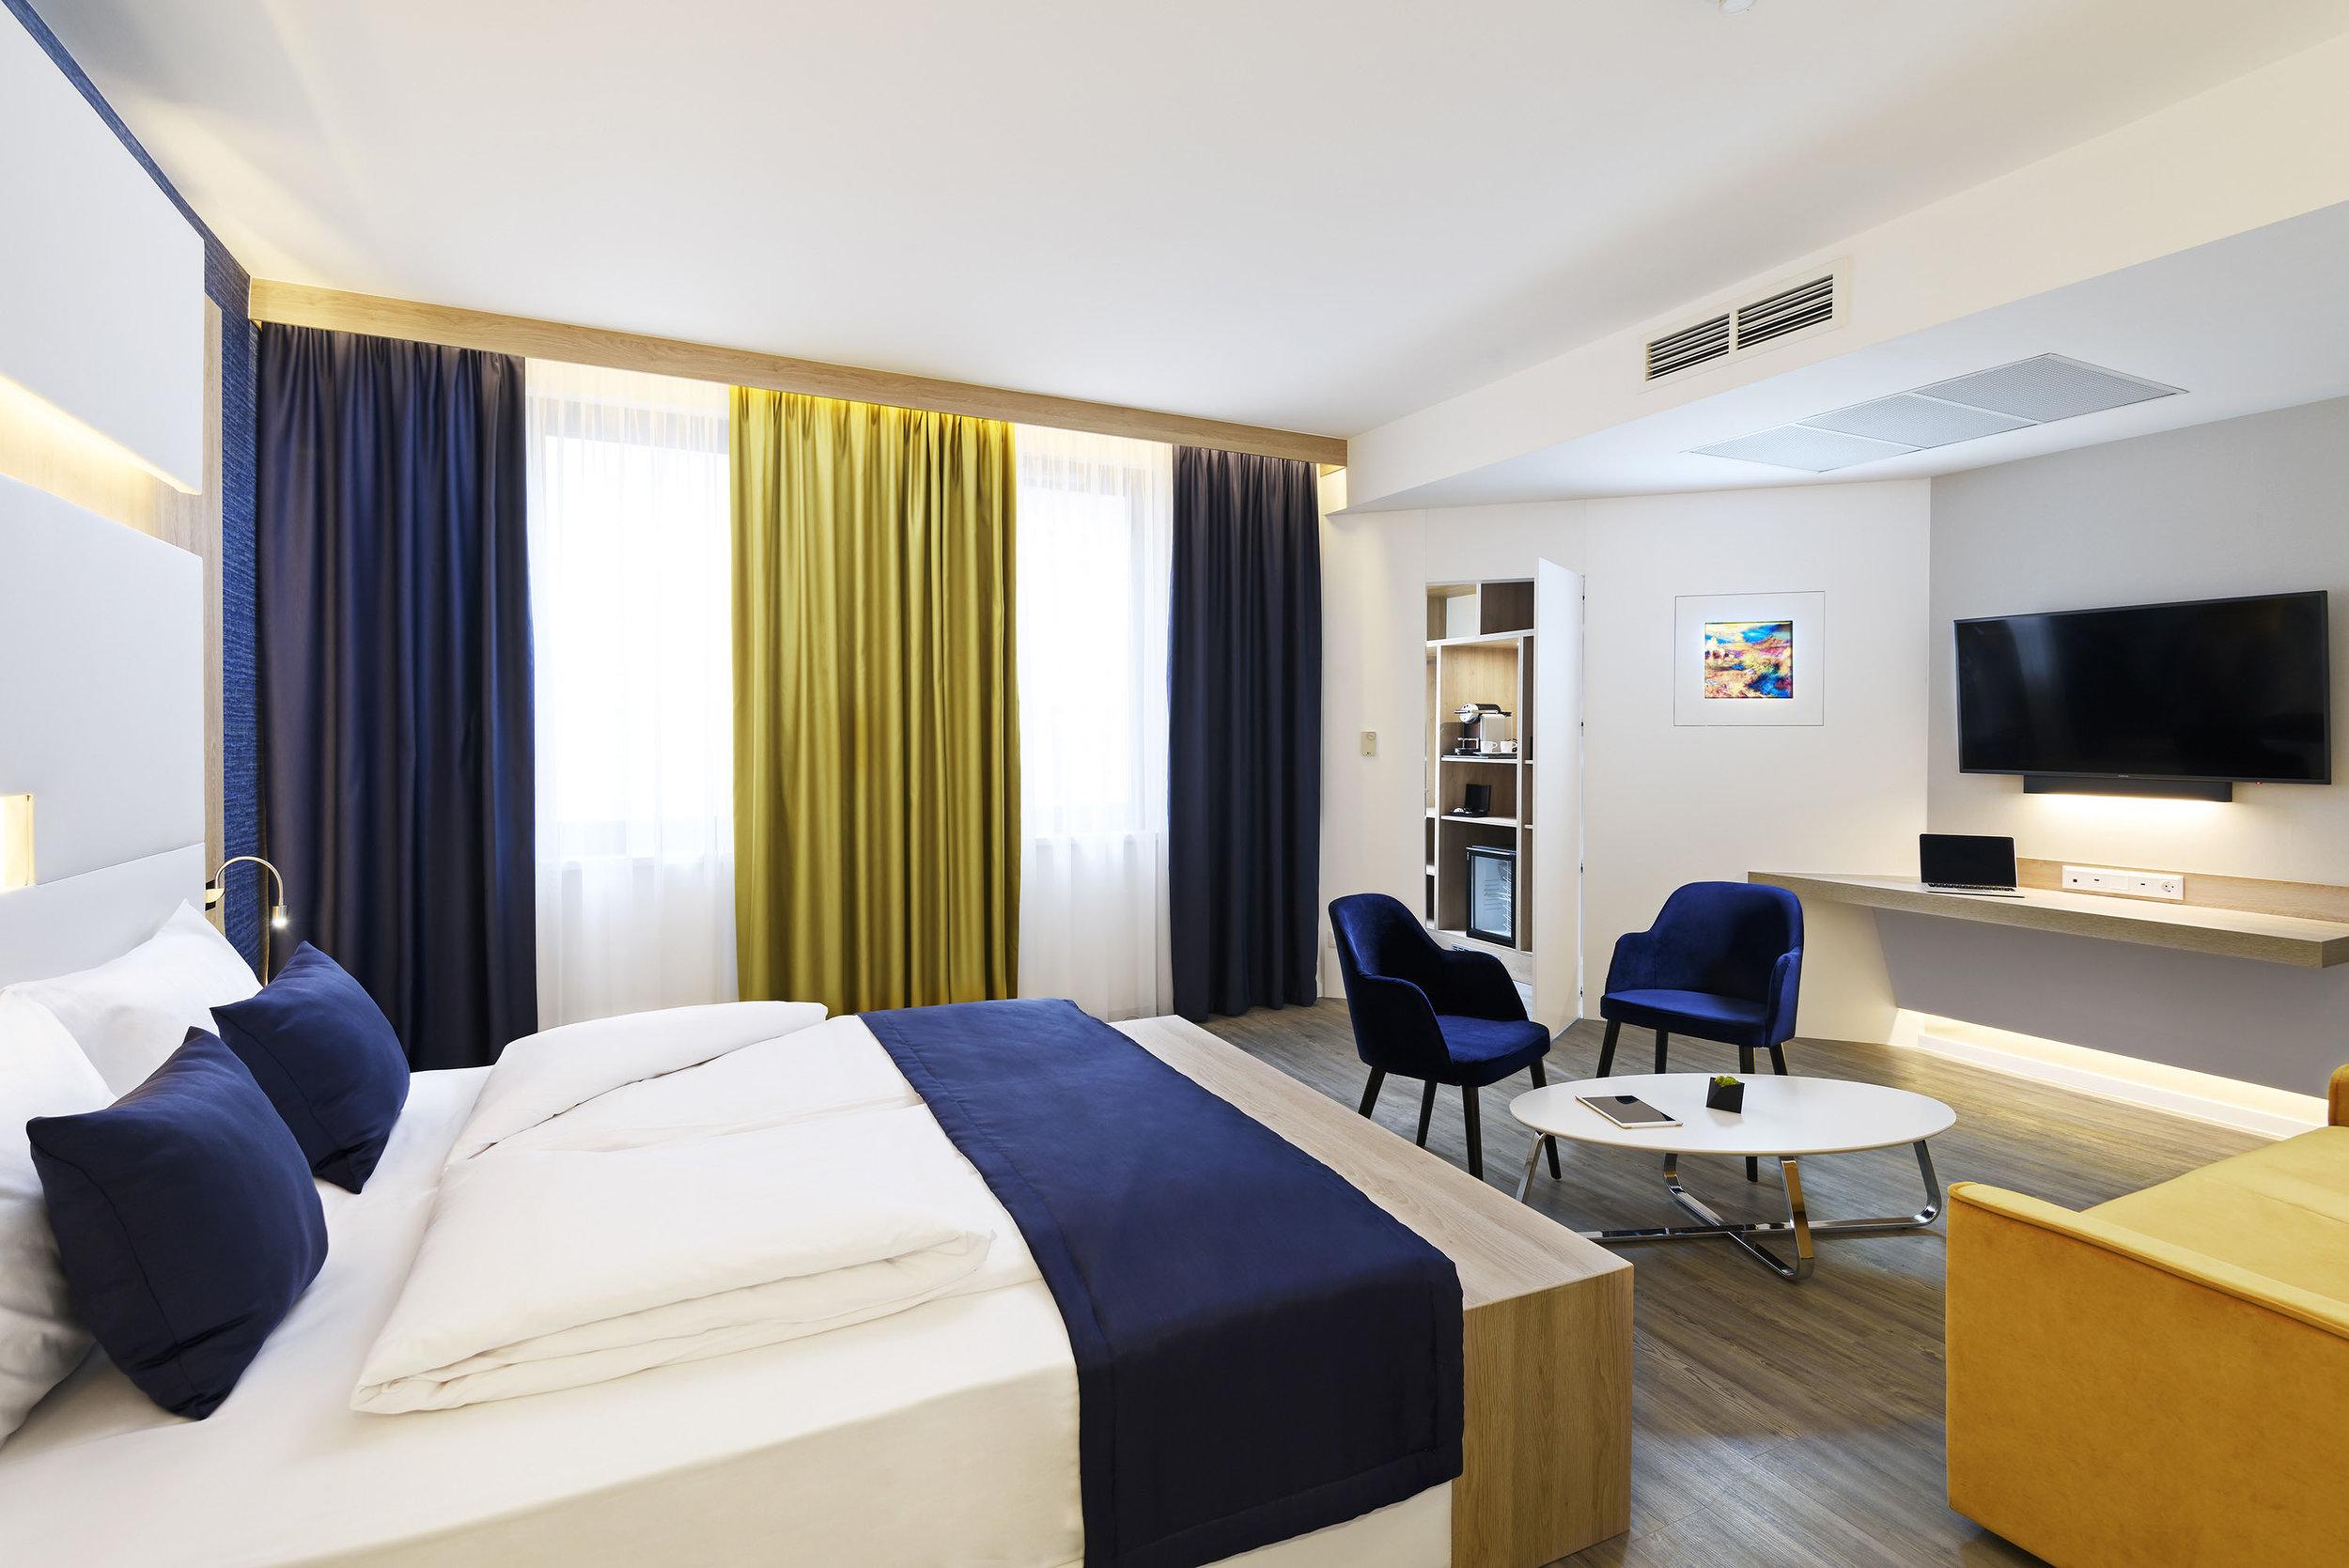 KVI_Hotel_305_02_mod.jpg